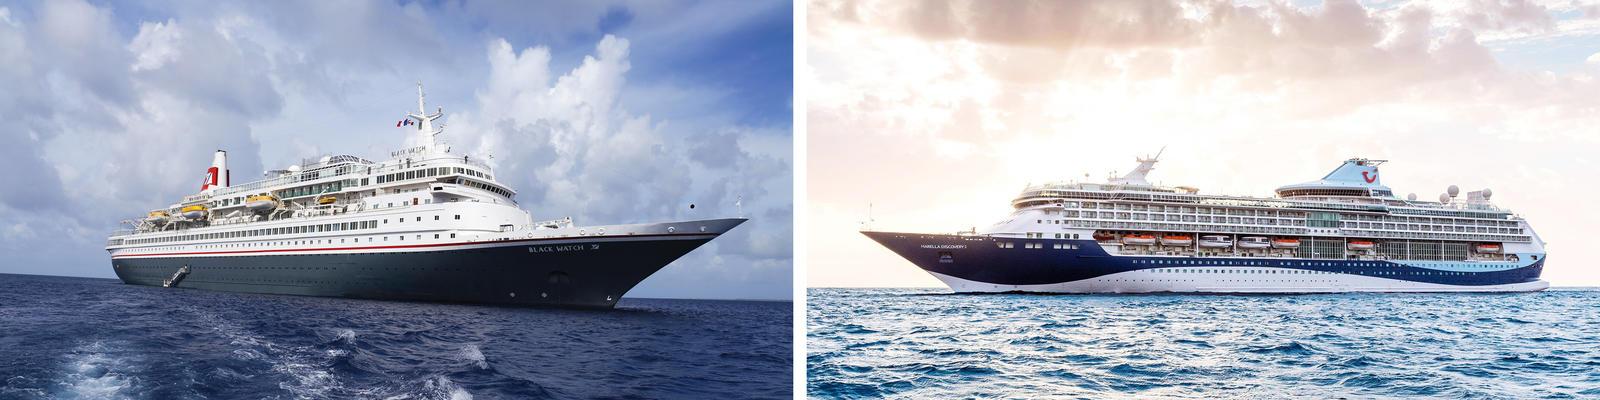 Black Watch & Marella Discovery 2 (Photo: Fred Olsen & Marella Cruises)